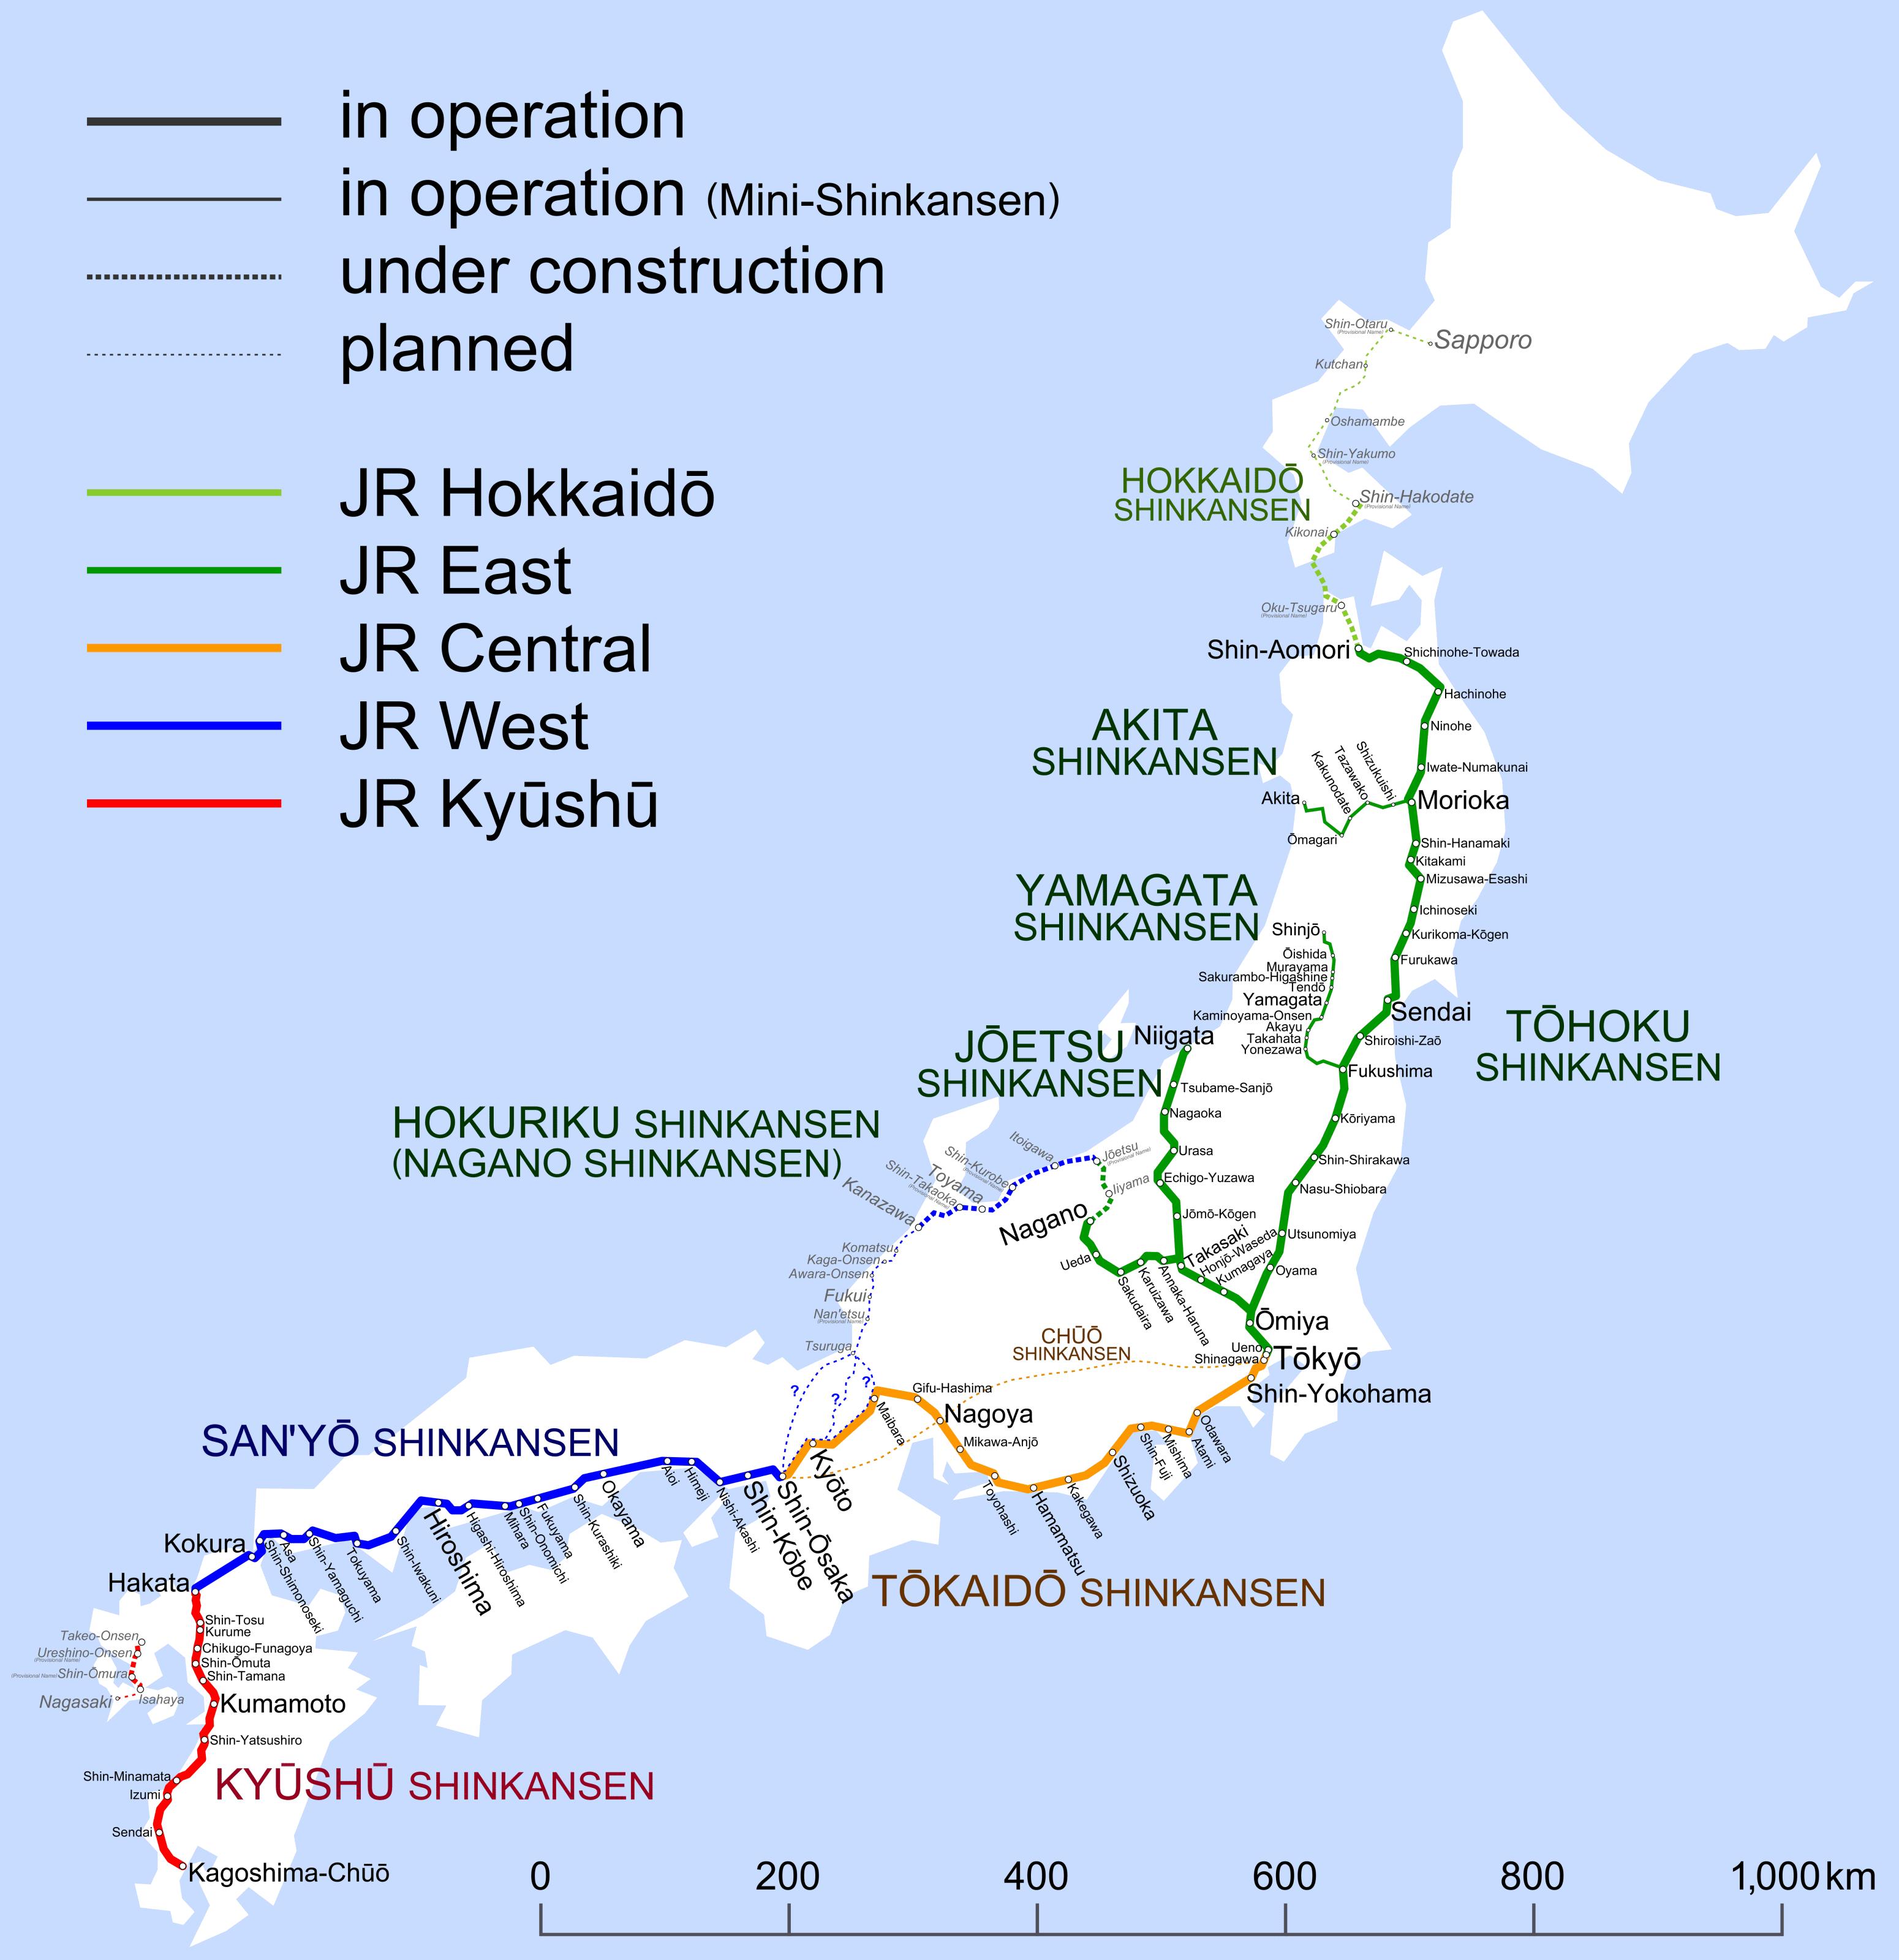 Shinkansen High Speed Rail In Japan Routes Japan Train Japan Travel Japan Travel Guide